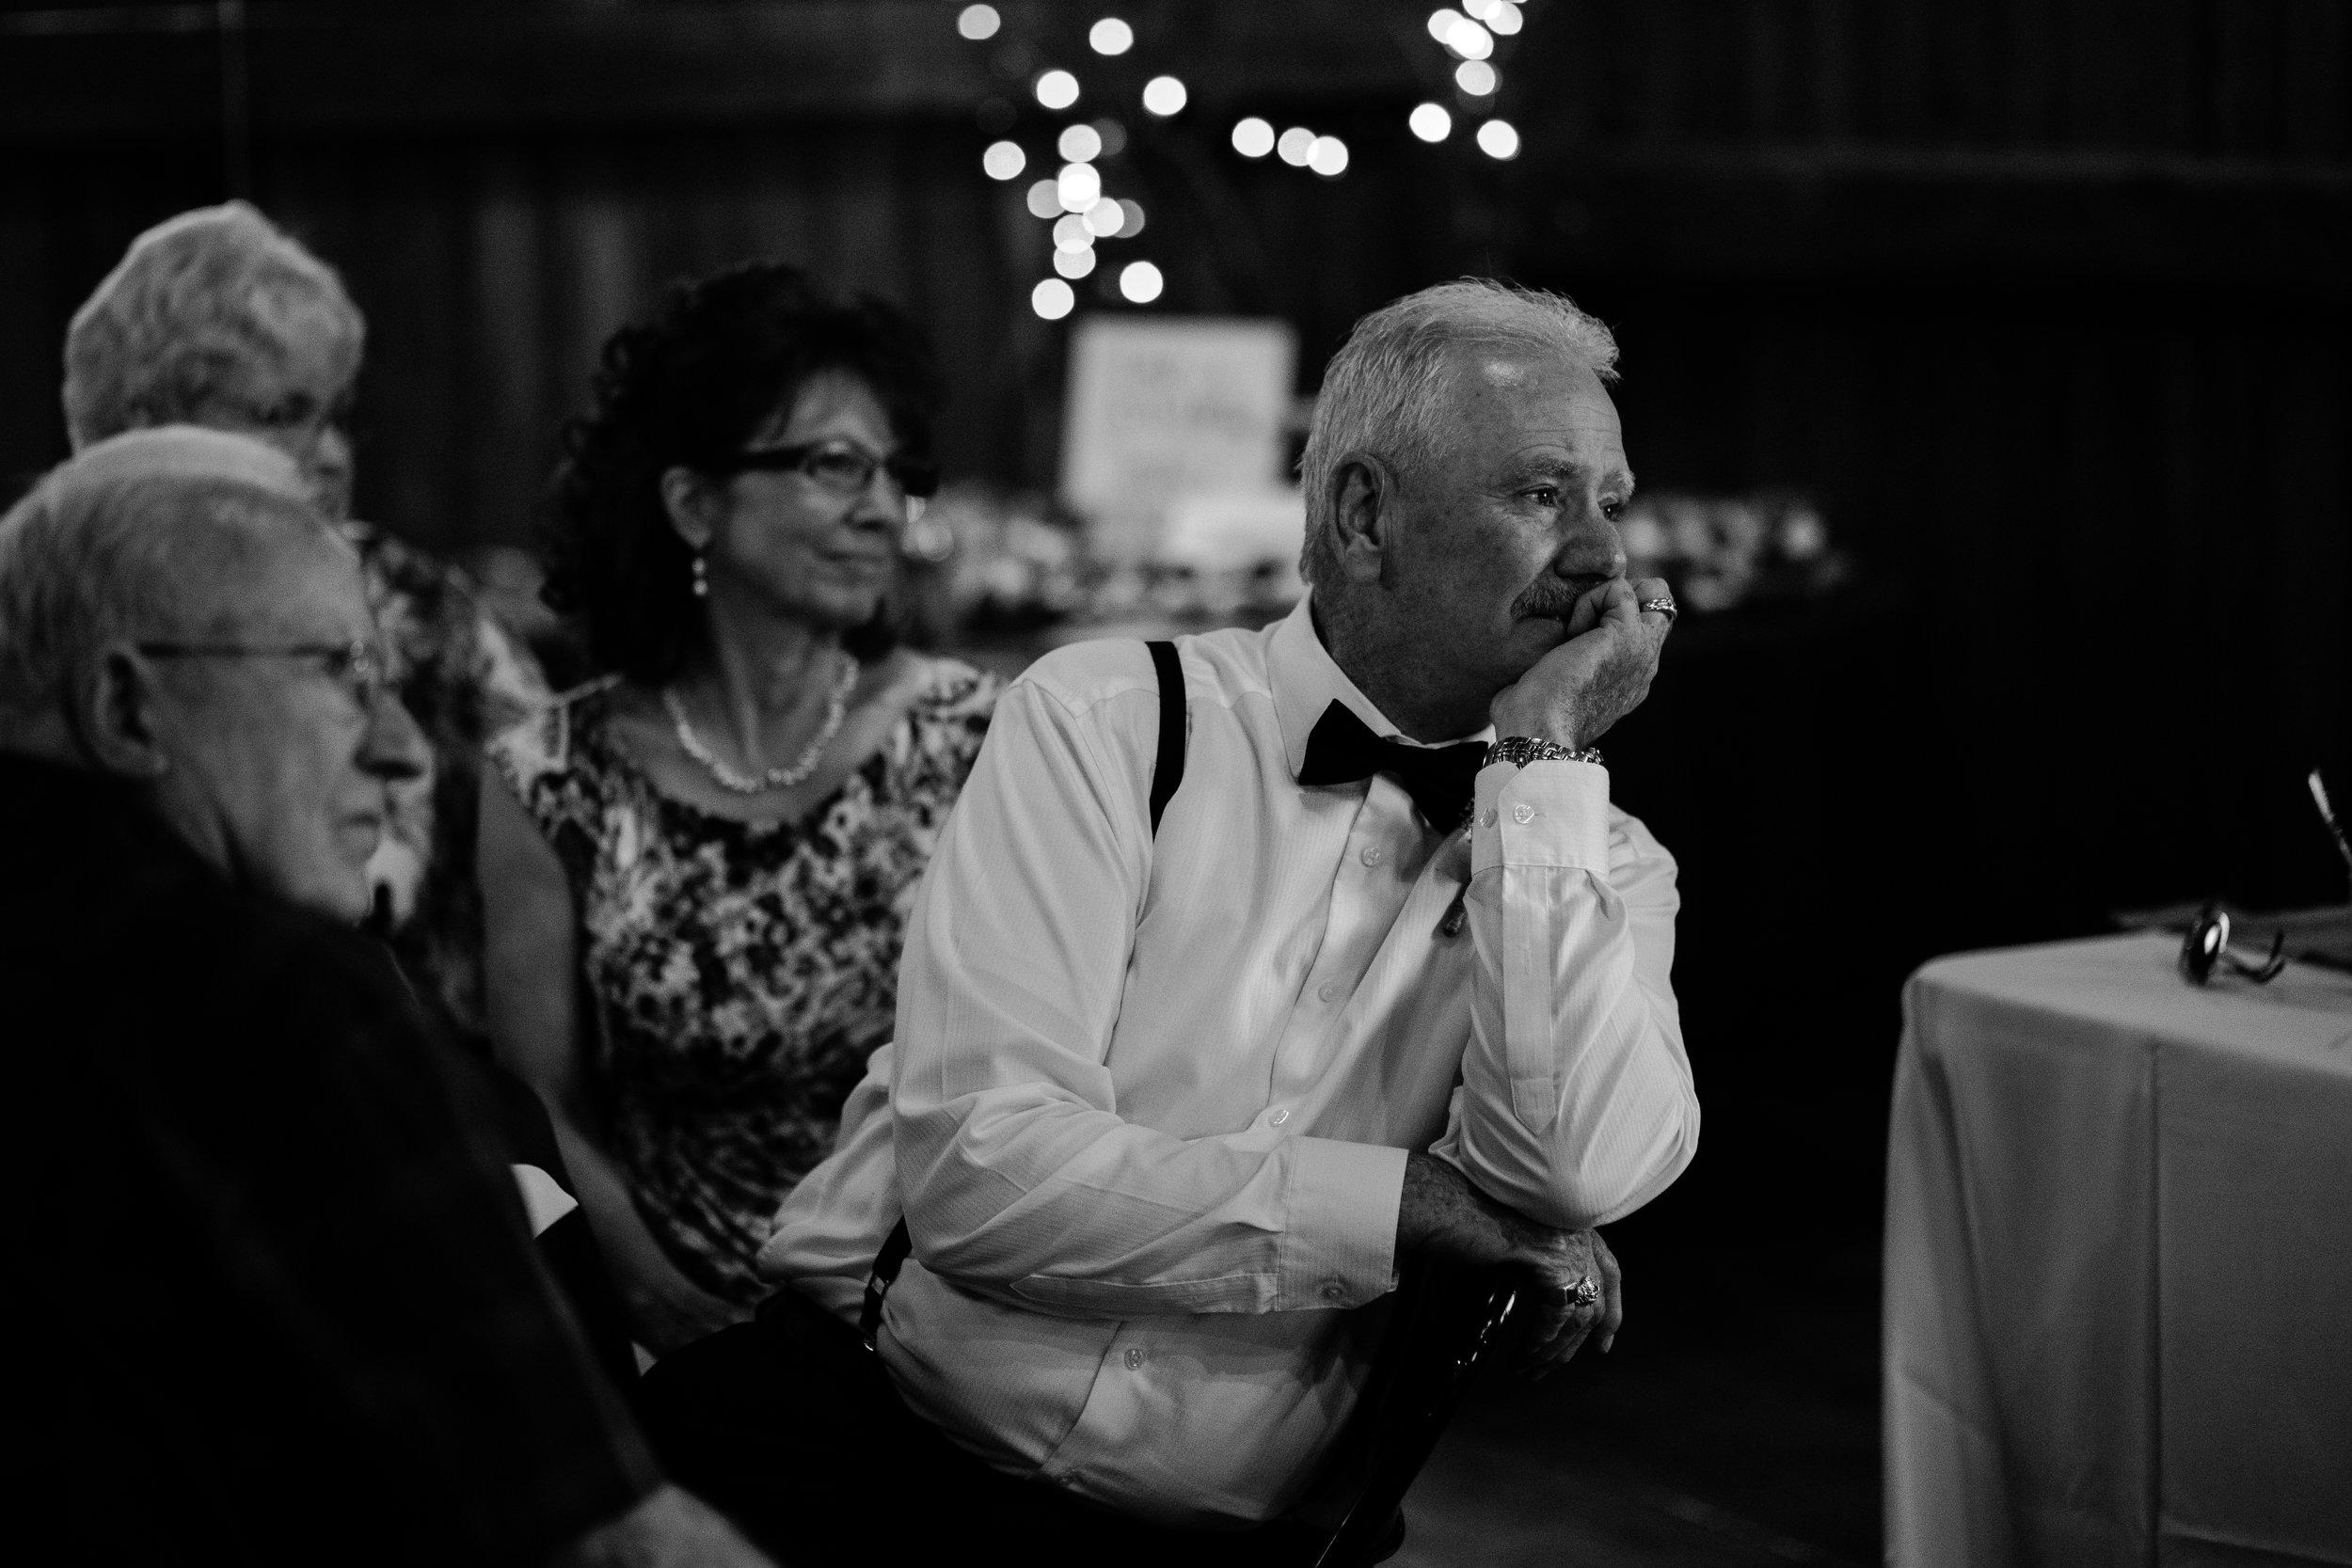 west-michigan-wedding-photographer-whitehall-rachel-austin-chapel-in-the-pines-412.jpg